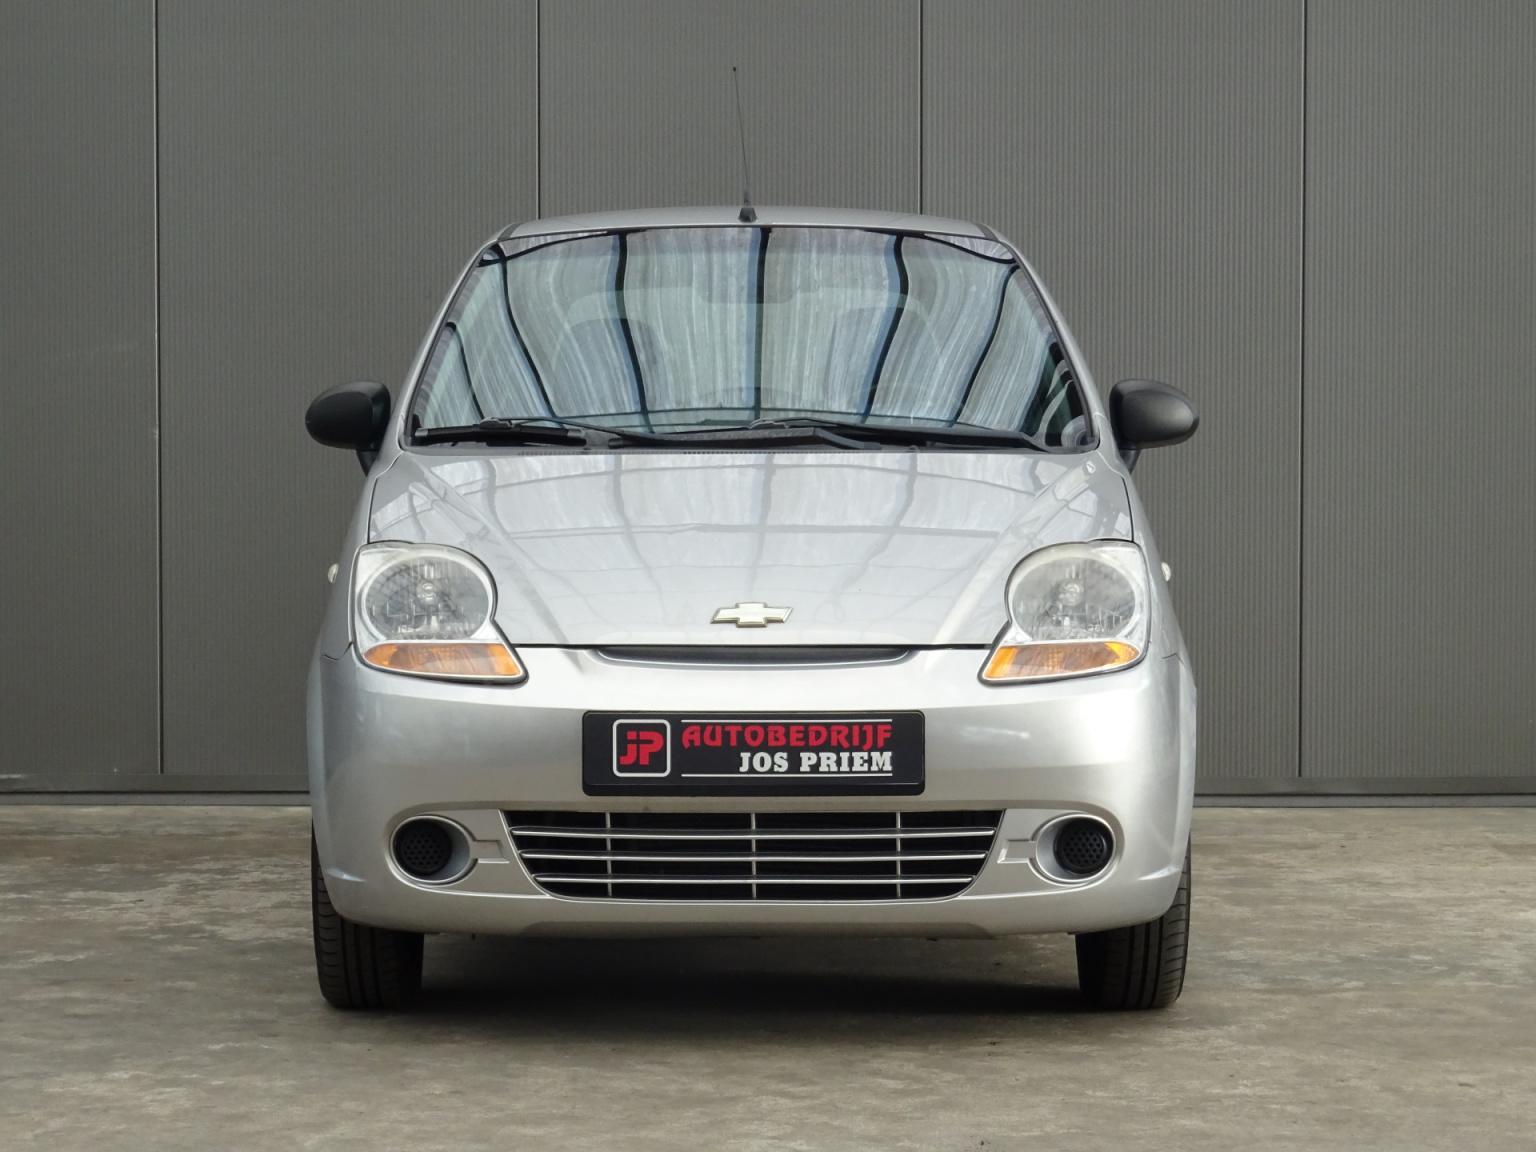 Chevrolet-Matiz-8